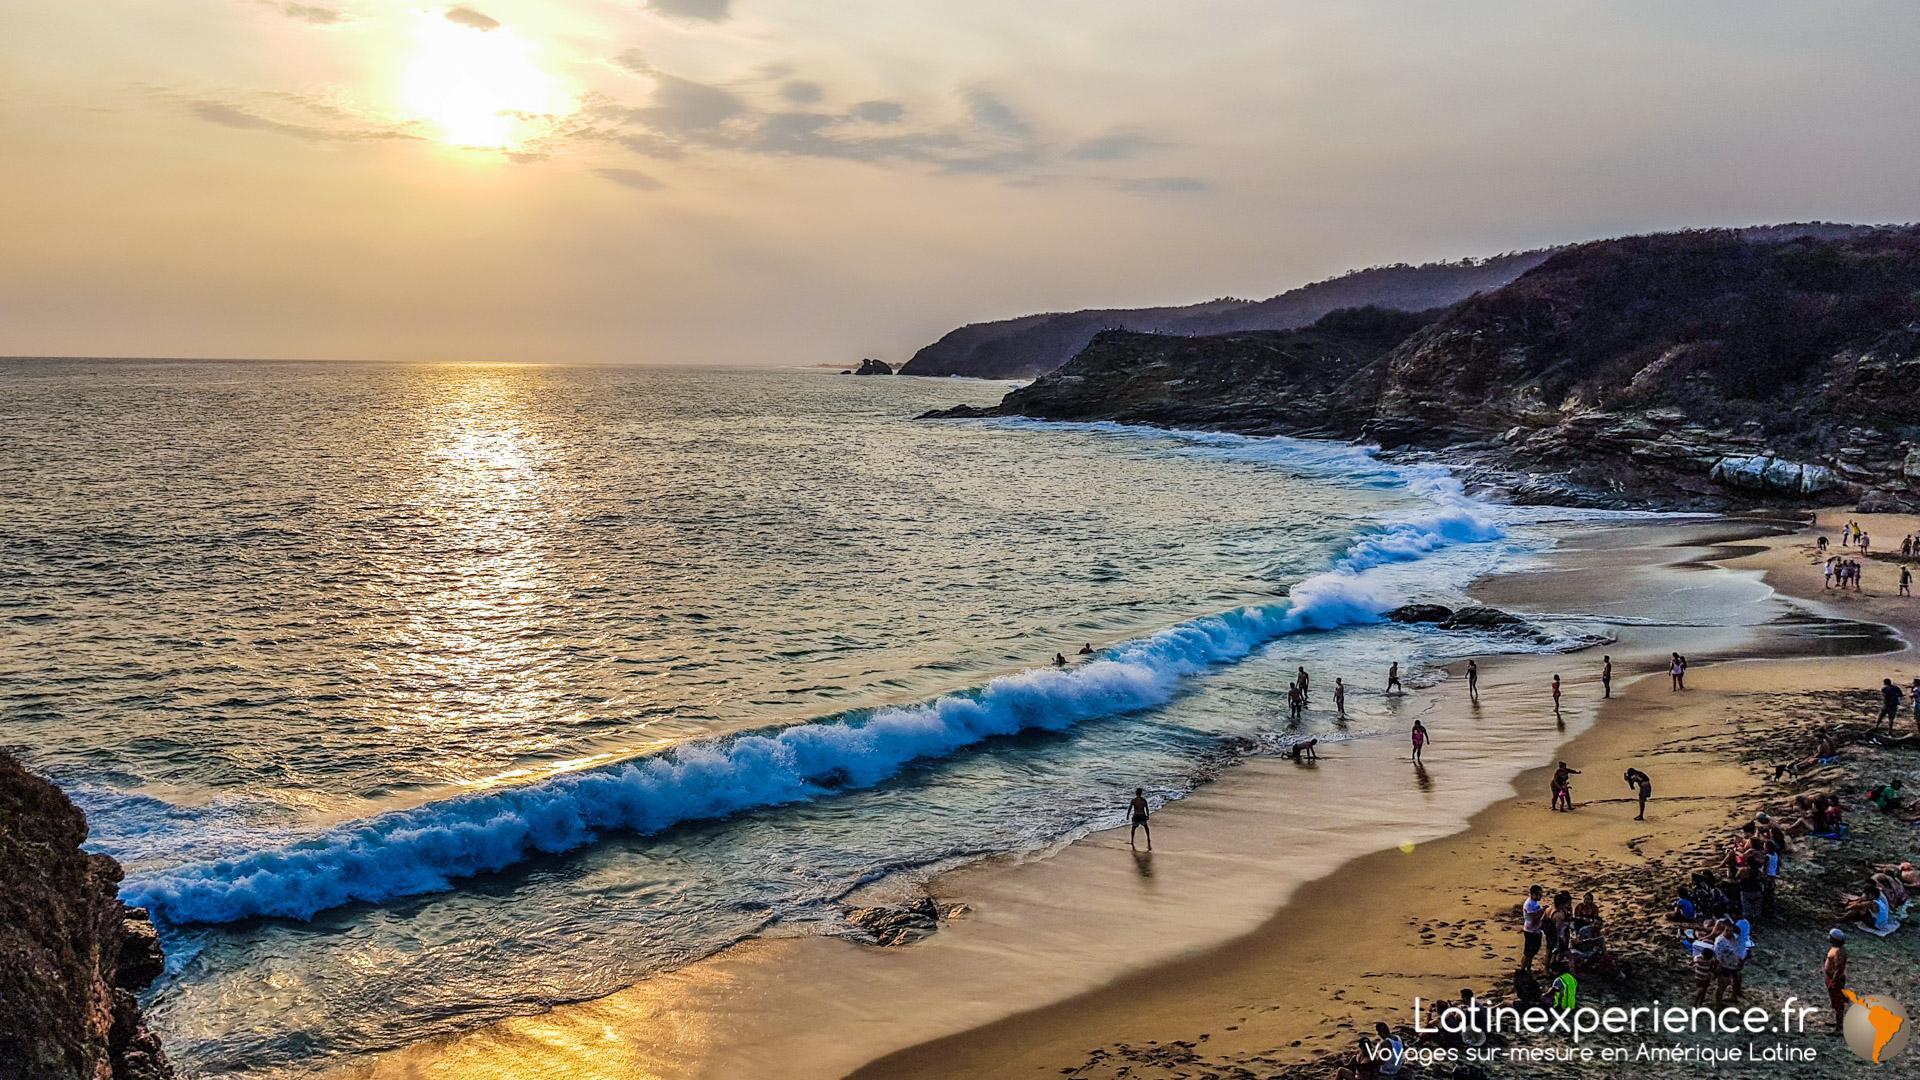 Séjour Mexique - San Angustinillo - Playa Cometa -Latinexperience voya